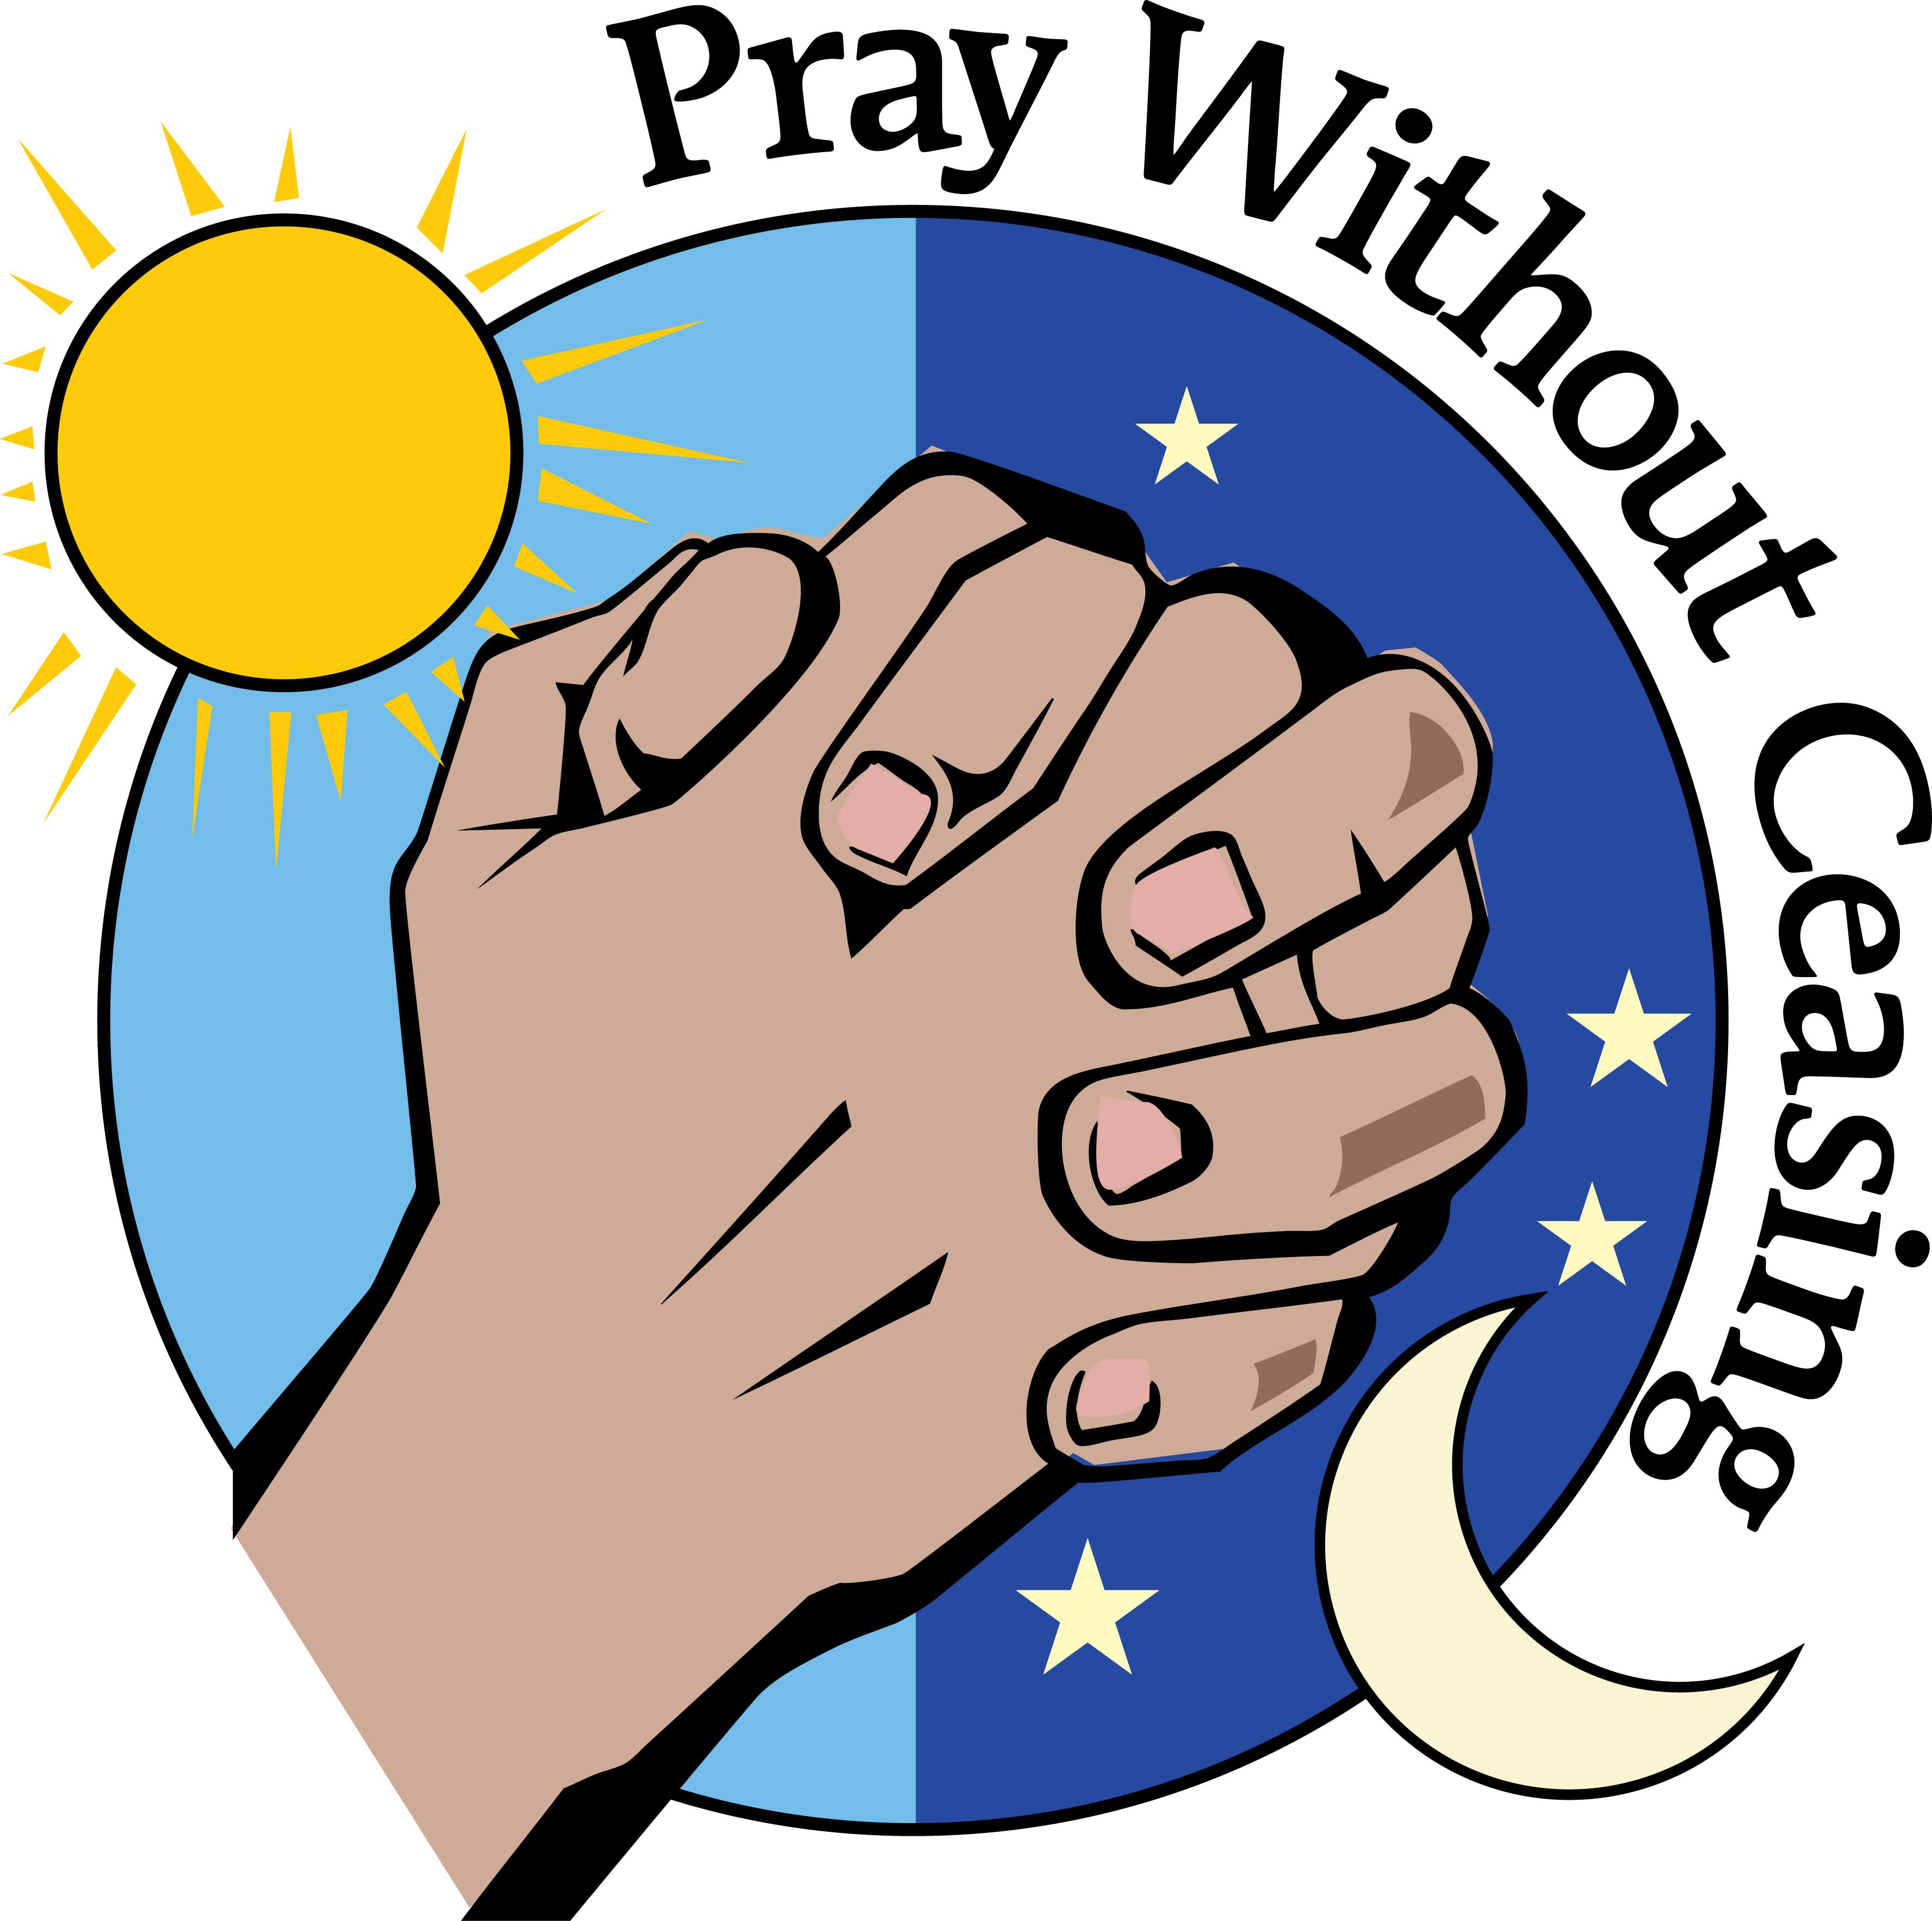 Healing clipart worship hand Prayer Wednesday at look Church